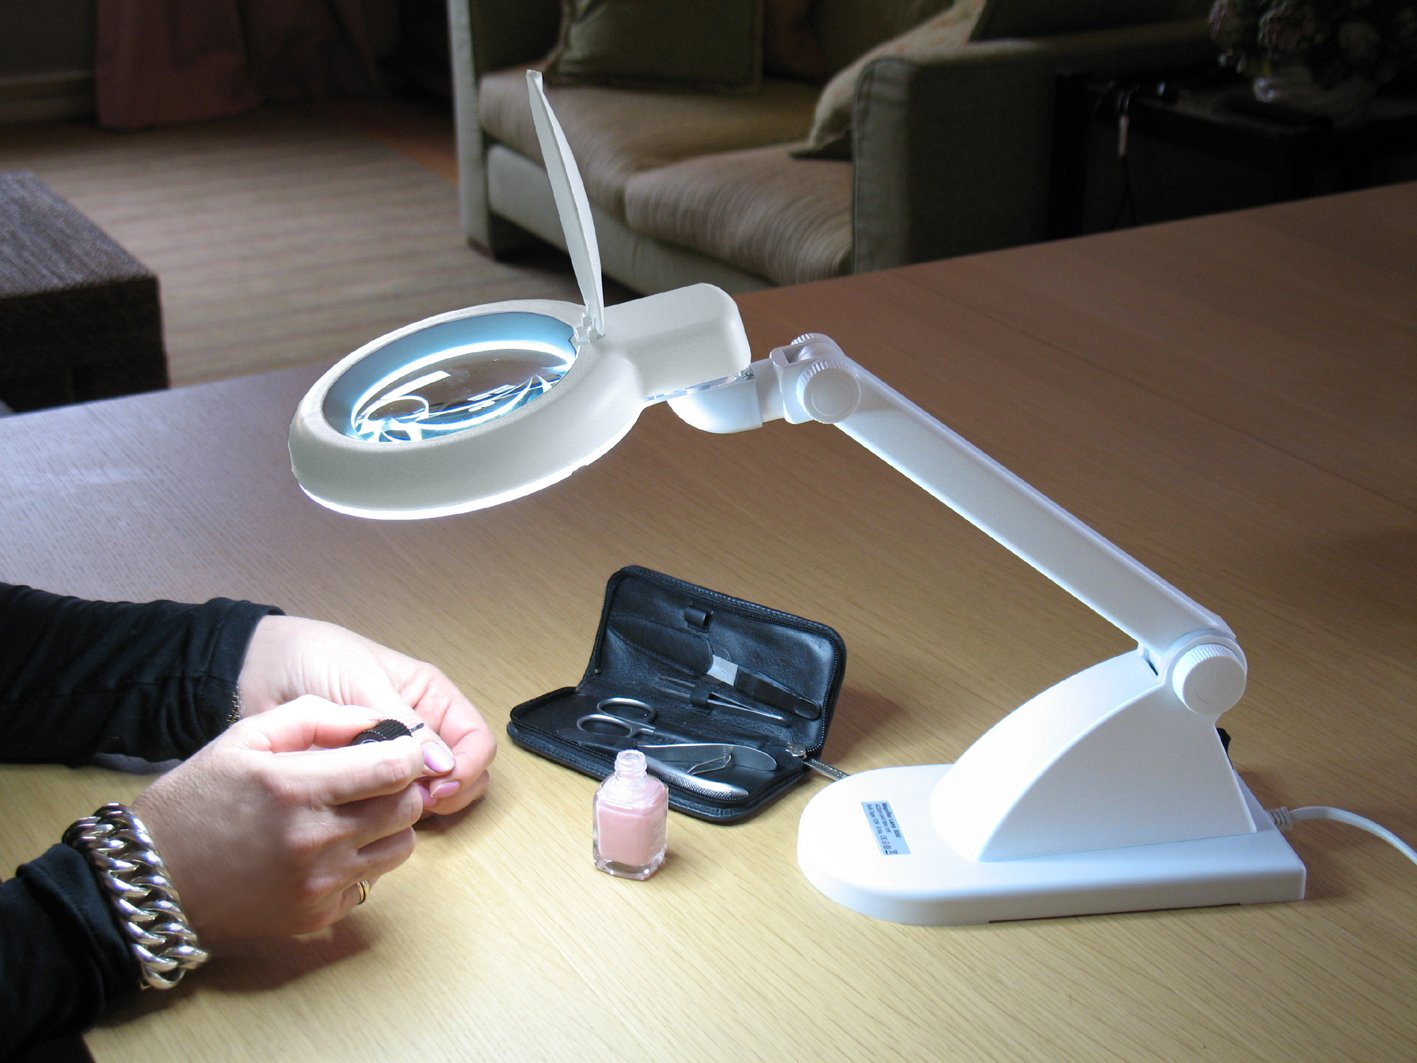 Velleman Daylight Lampada con Lente d' ingrandimento, Neon Brillante